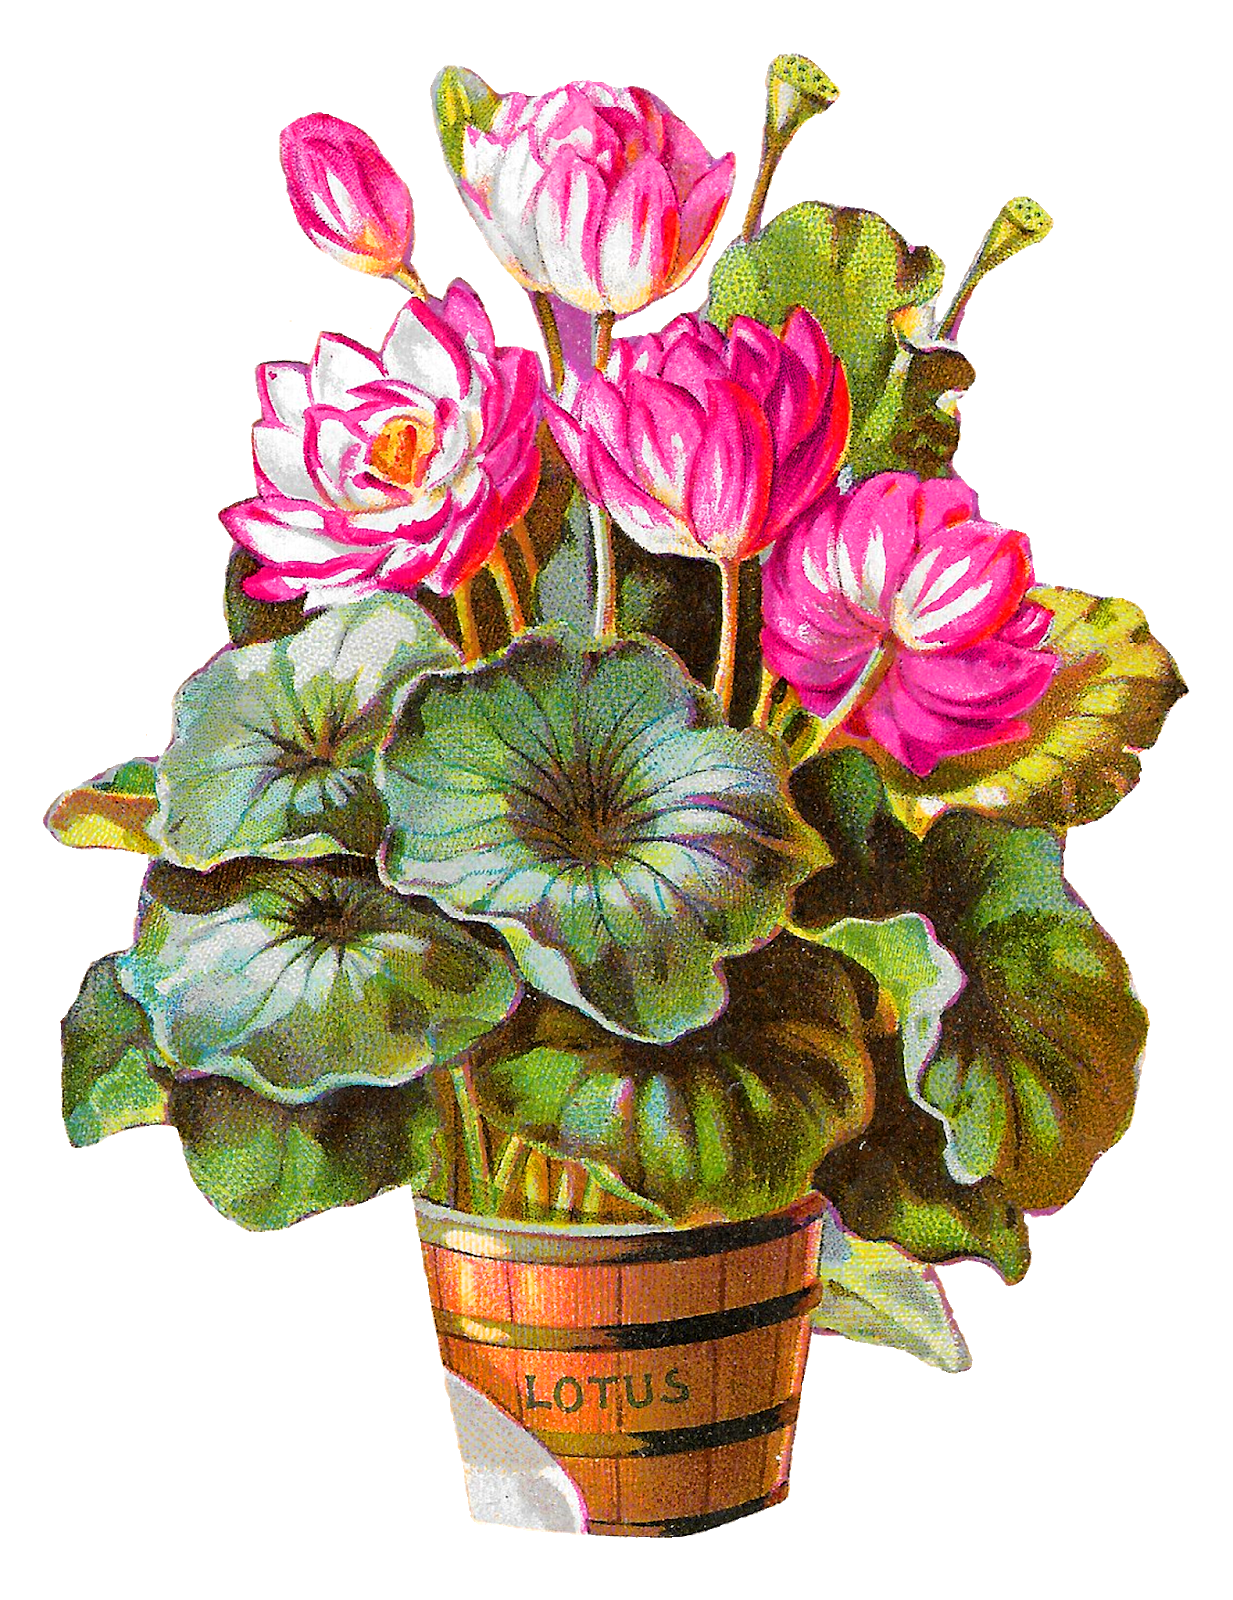 Plant a flower clipart jpg Antique Images: Royalty-Free Lotus Flower Potted Plant Barrel ... jpg